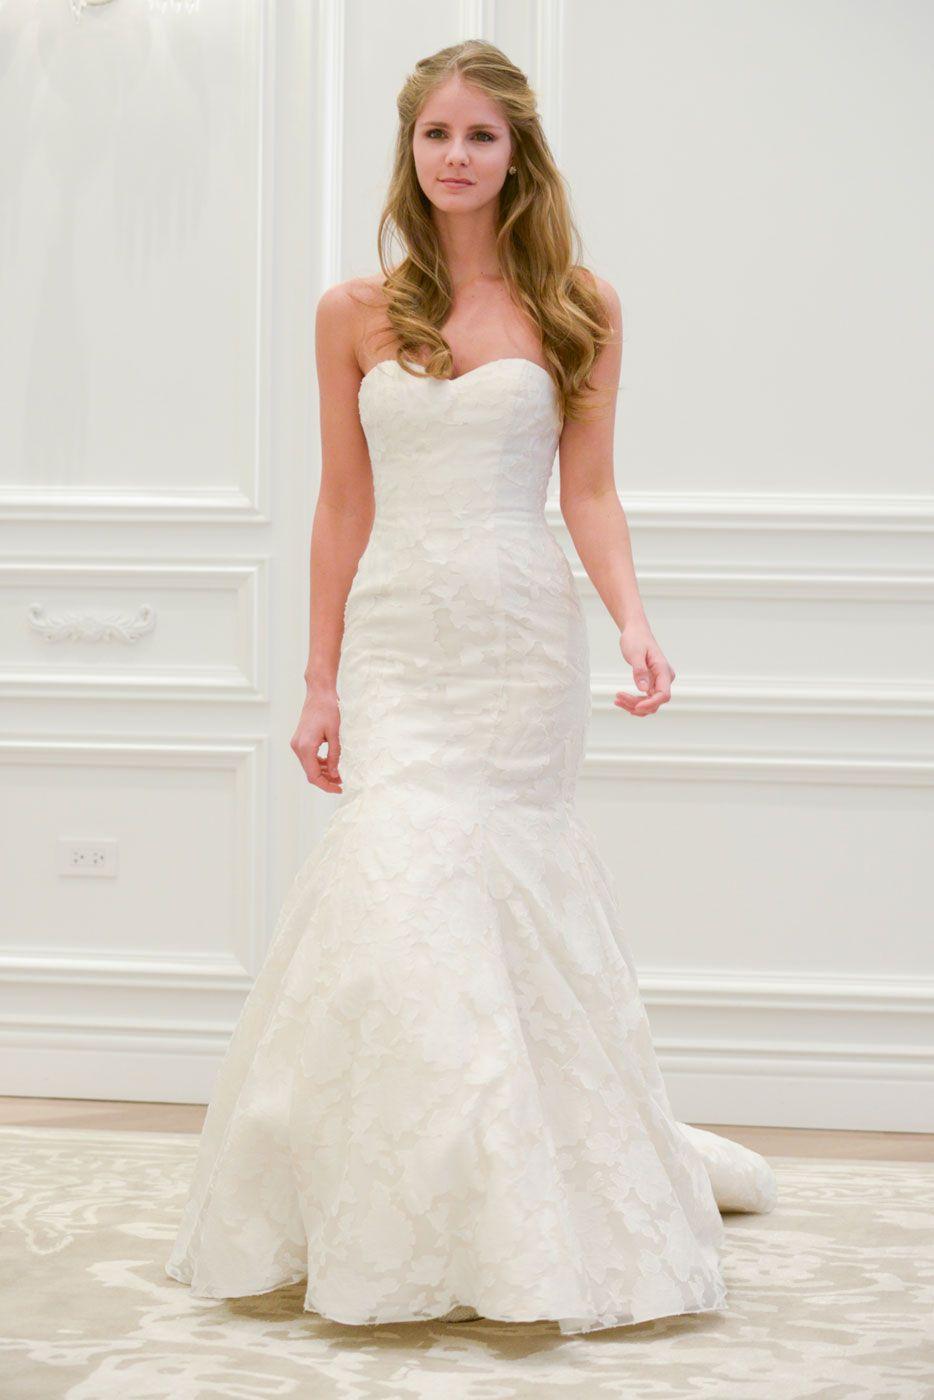 Trendy wedding dresses   Wedding Dresses to Inspire Any Modern Bride  Wedding dress